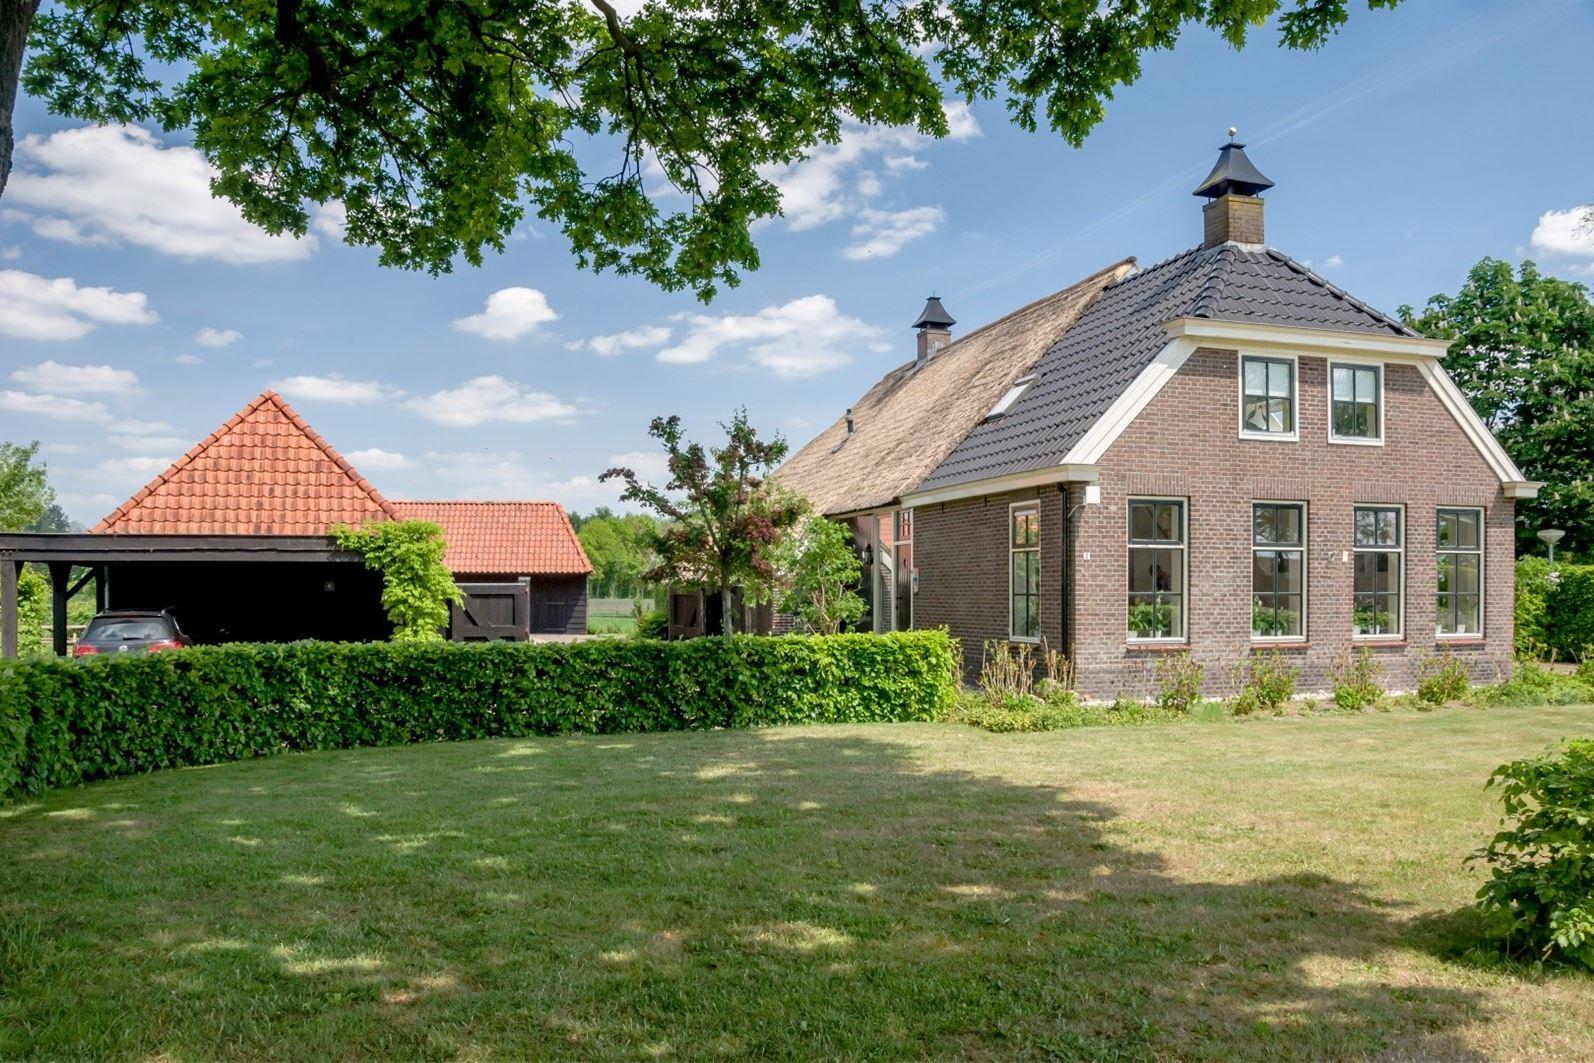 Huis te koop holtien 8 7991 pn dwingeloo funda for Funda koopwoningen